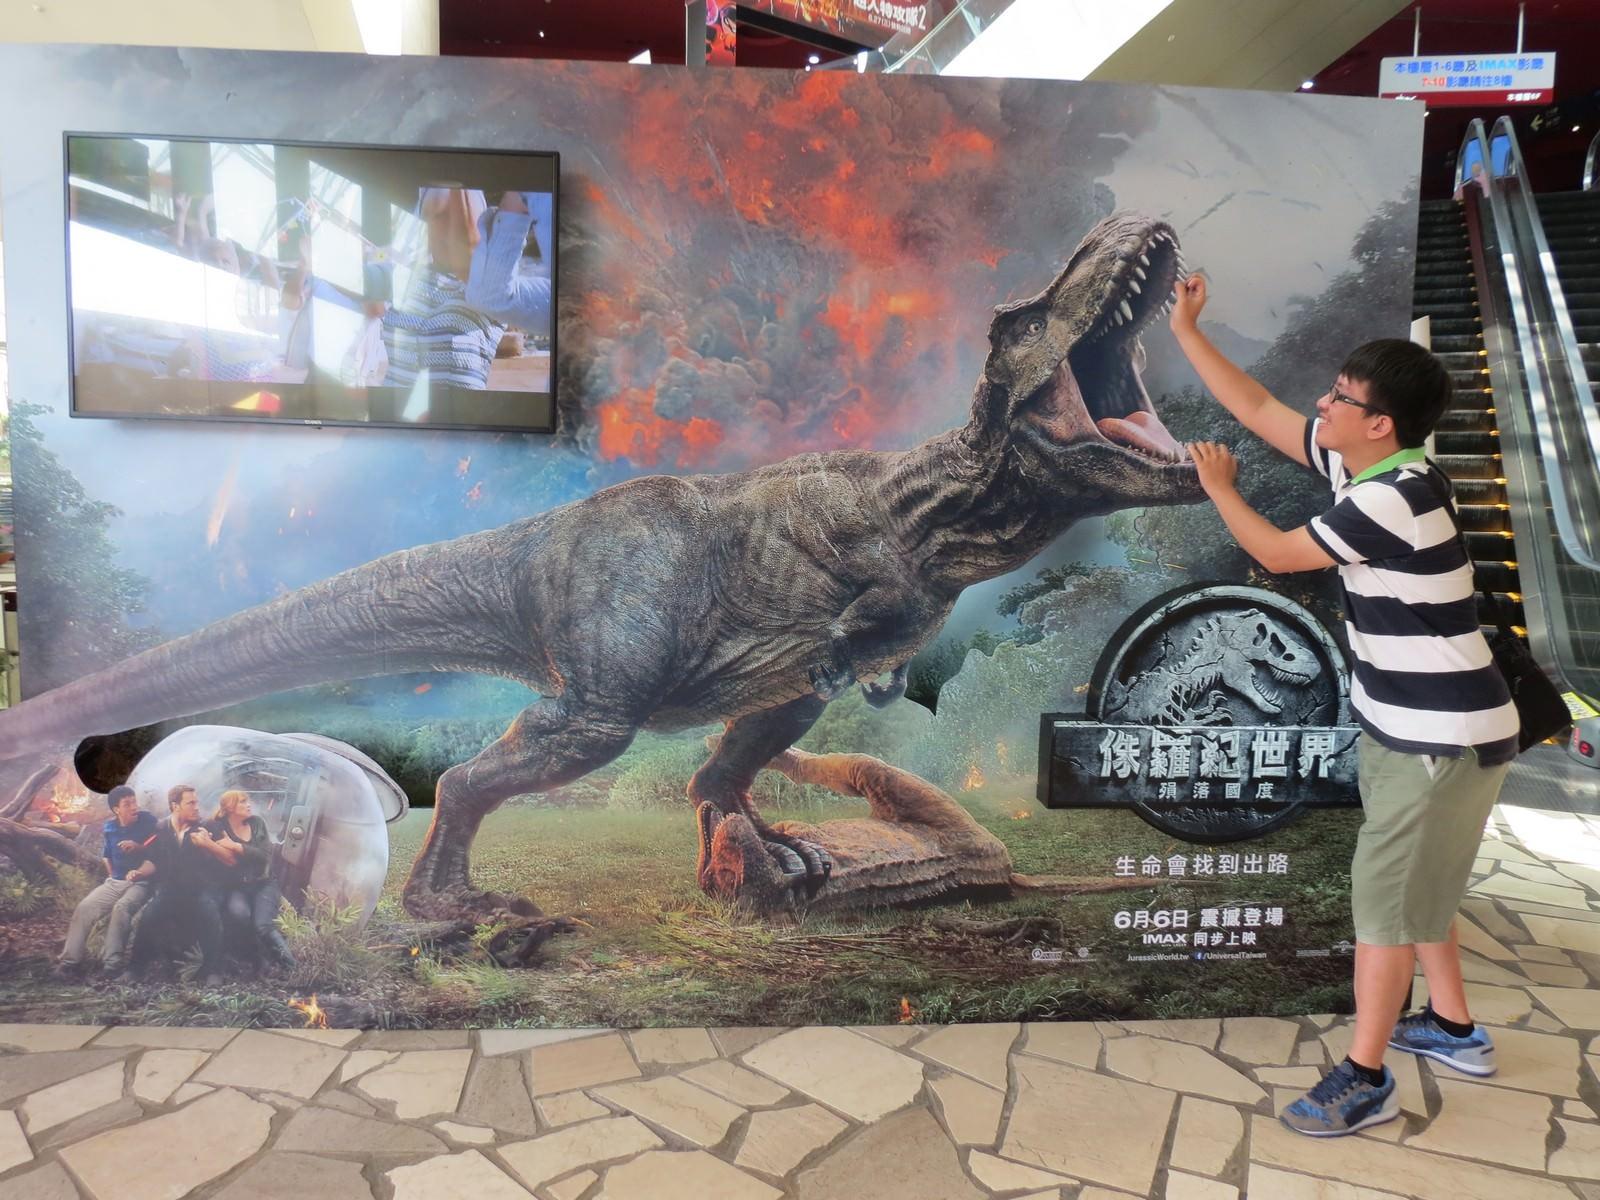 Movie, Jurassic World: Fallen Kingdom(美國) / 侏羅紀世界:殞落國度(台) / 侏罗纪世界2(中) / 侏羅紀世界:迷失國度(港), 廣告看板